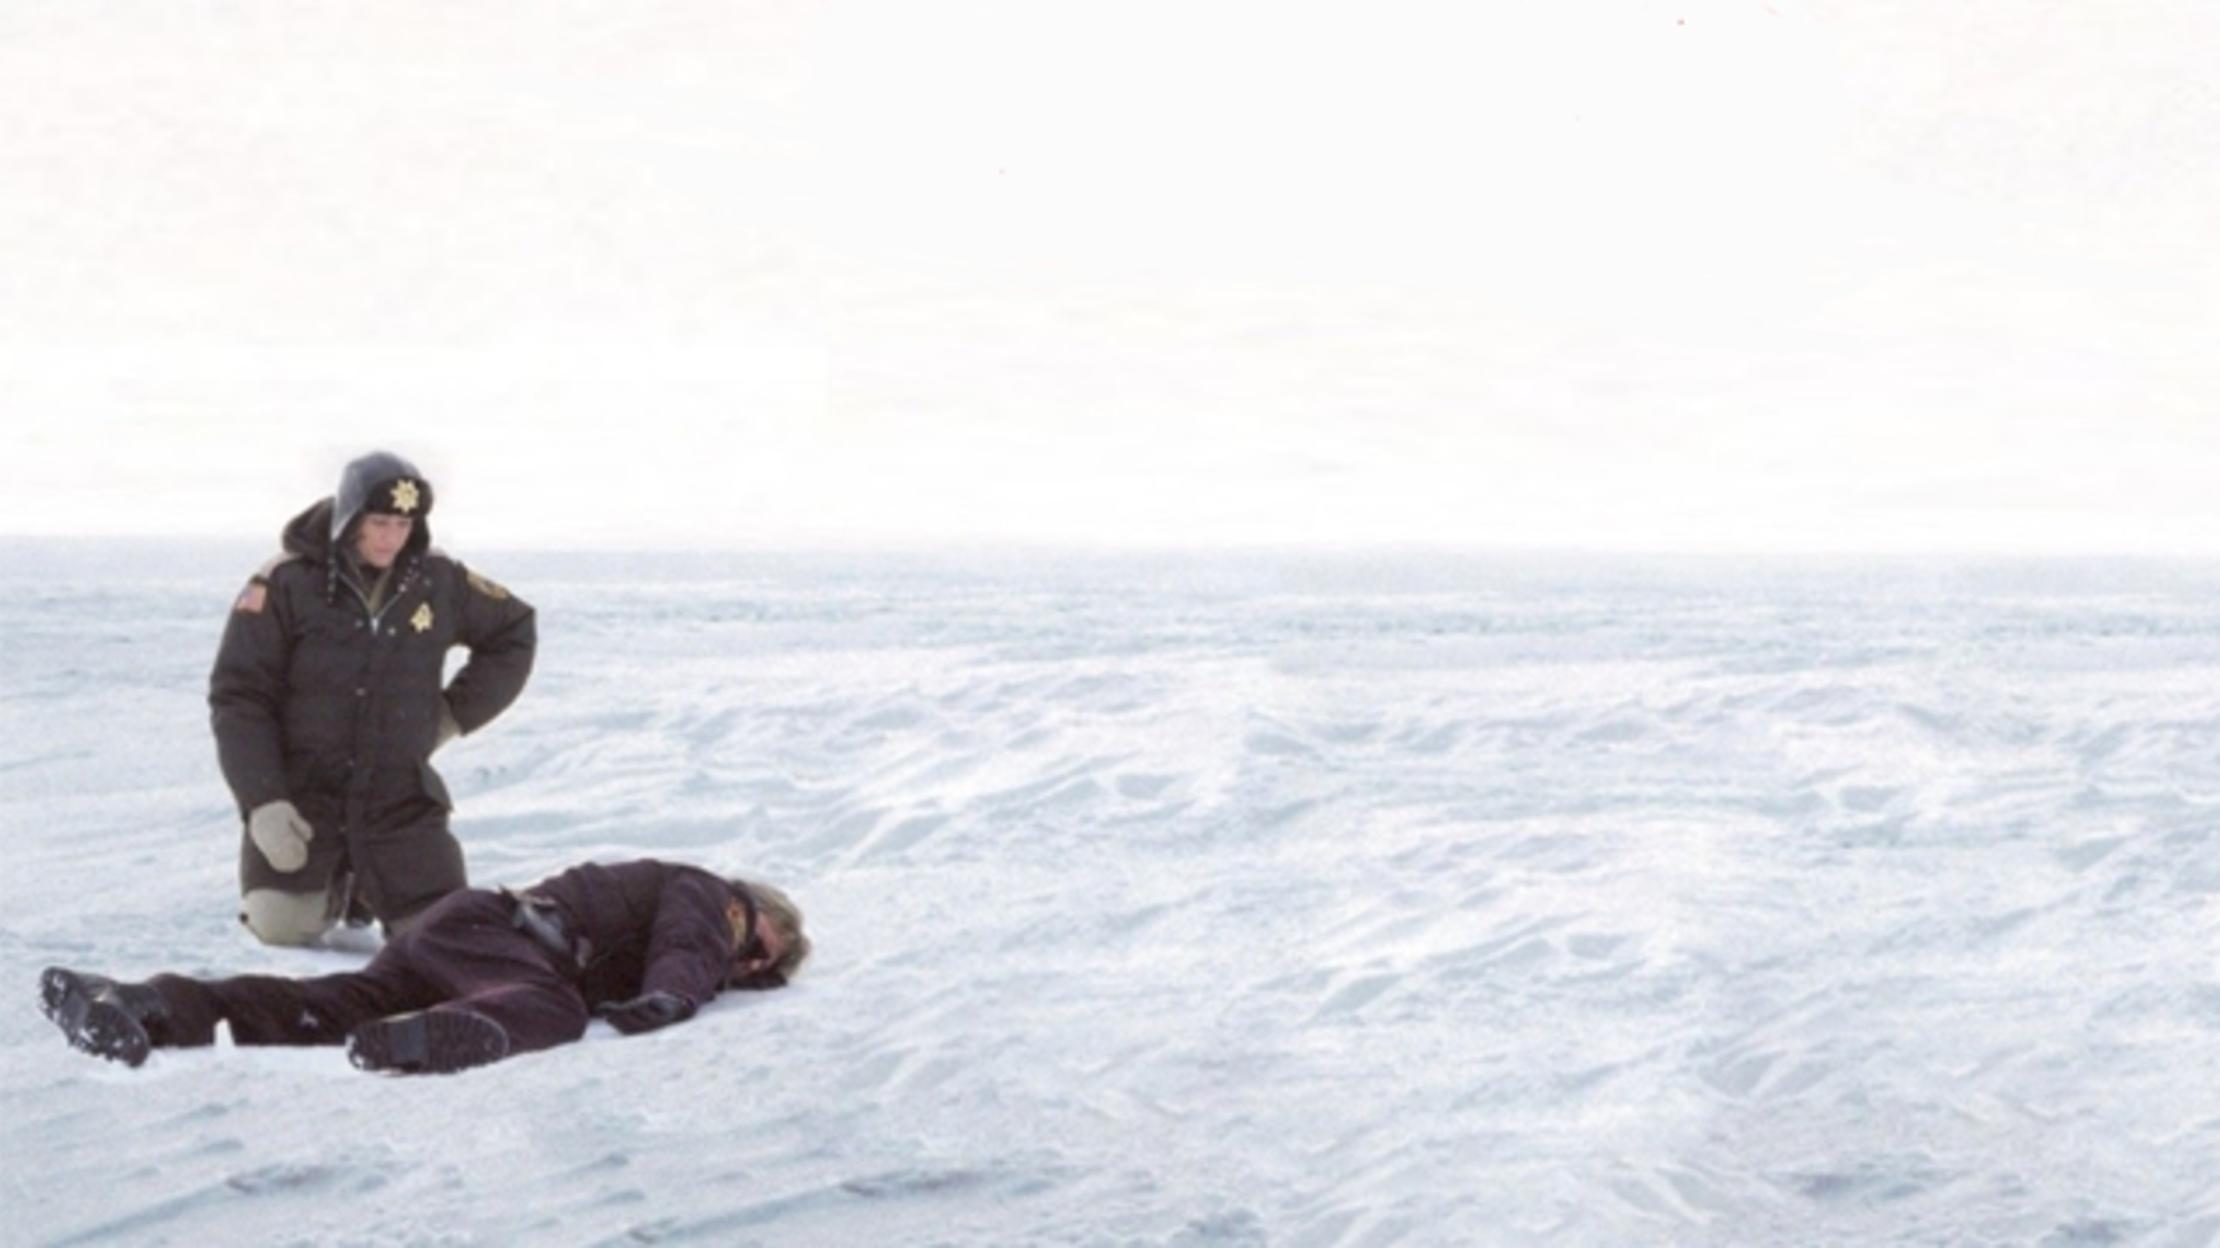 21 Darn Tootin' Facts About 'Fargo' | Mental Floss